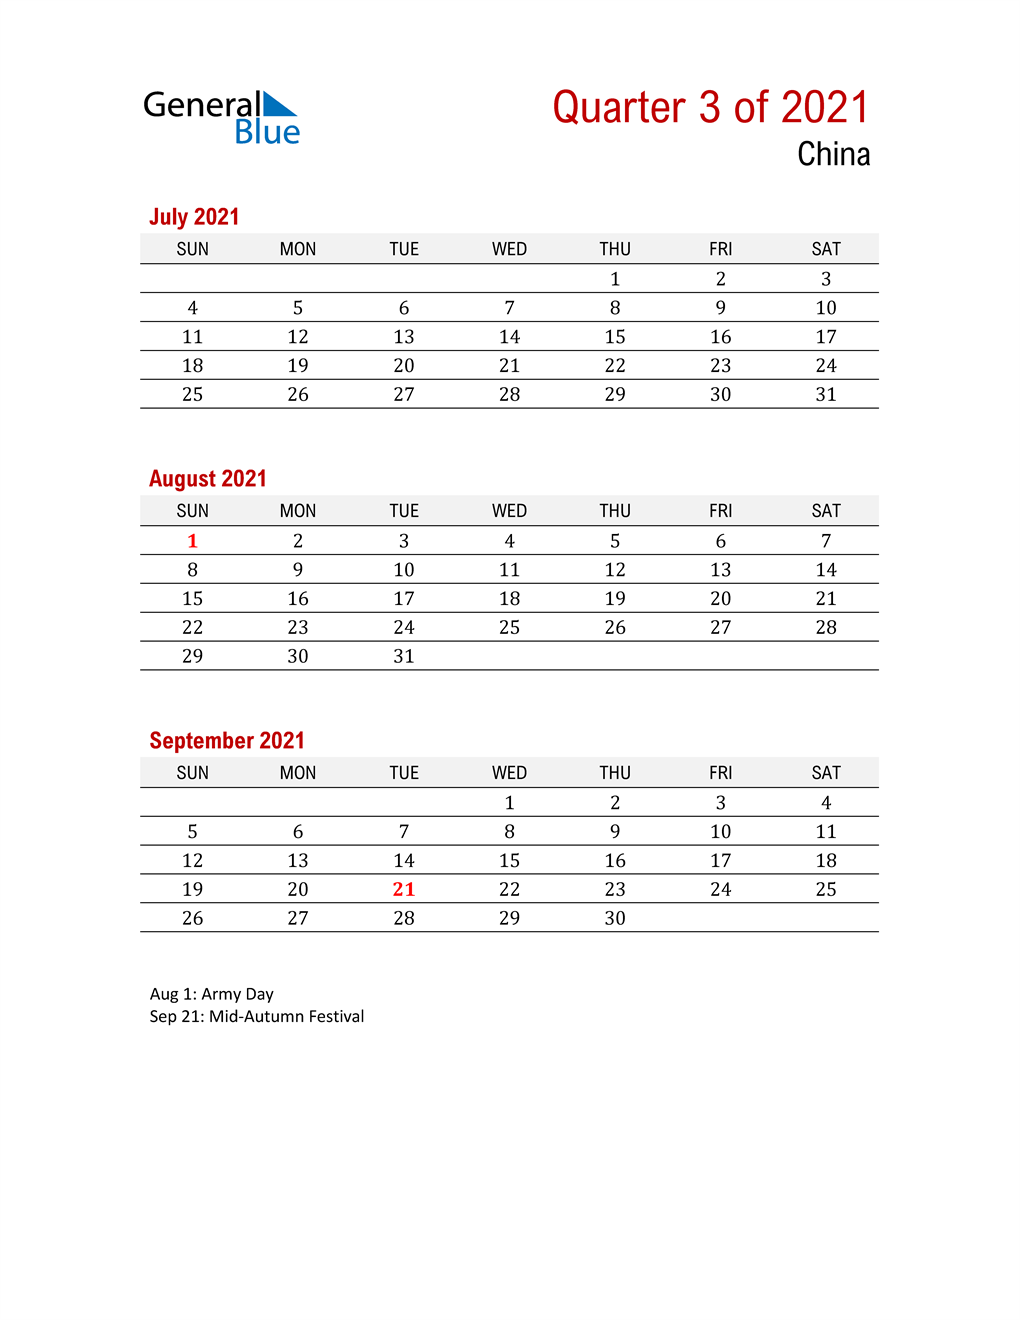 Printable Three Month Calendar for China